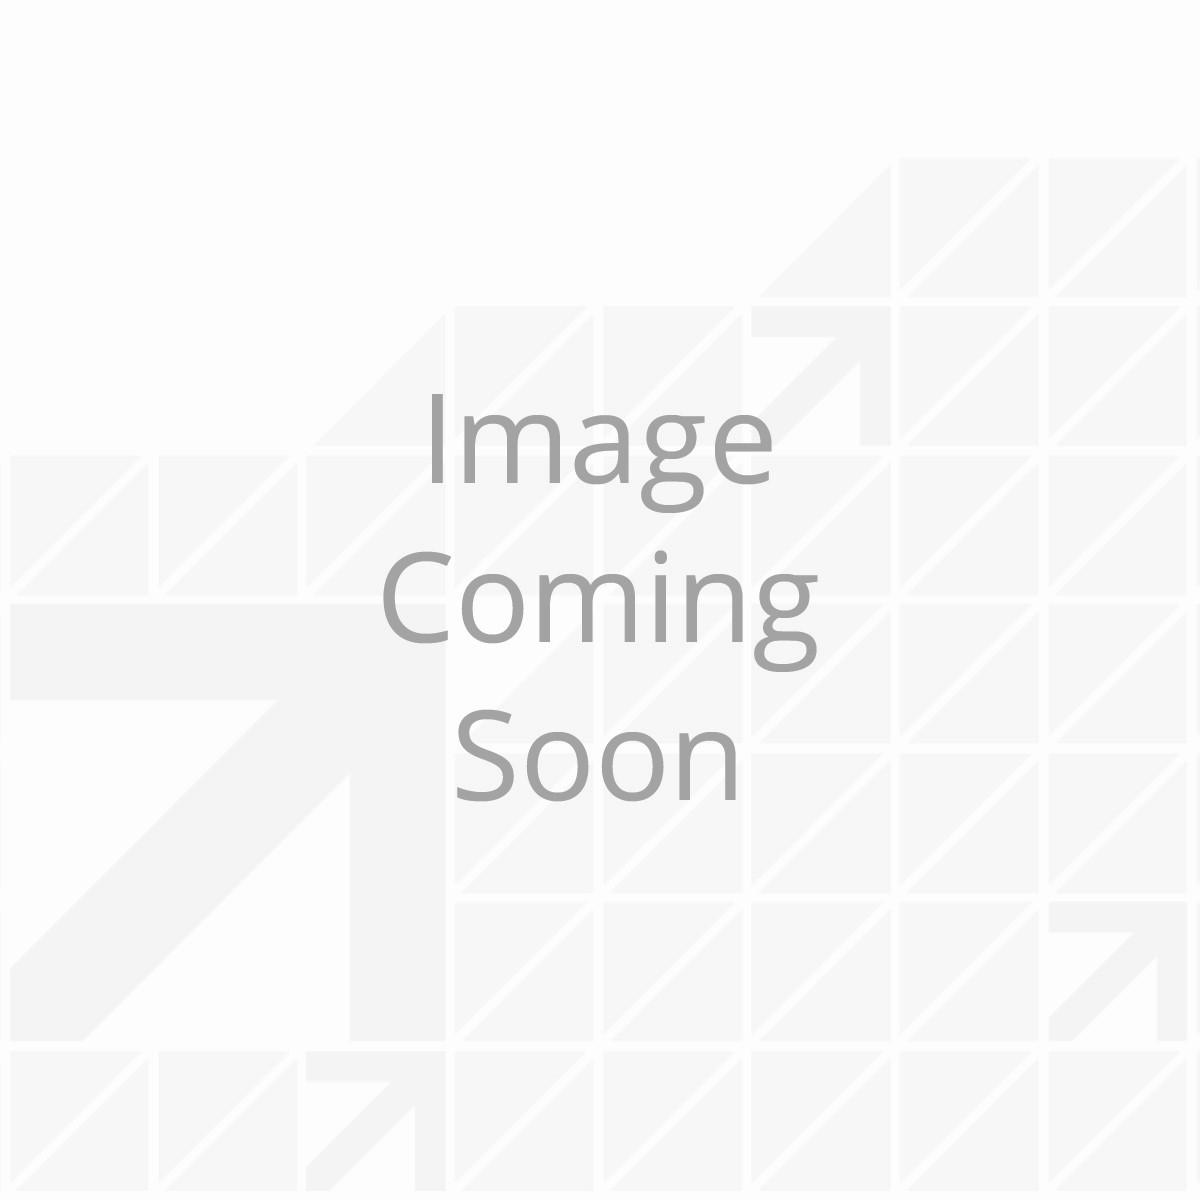 30A Cordset - Various Options